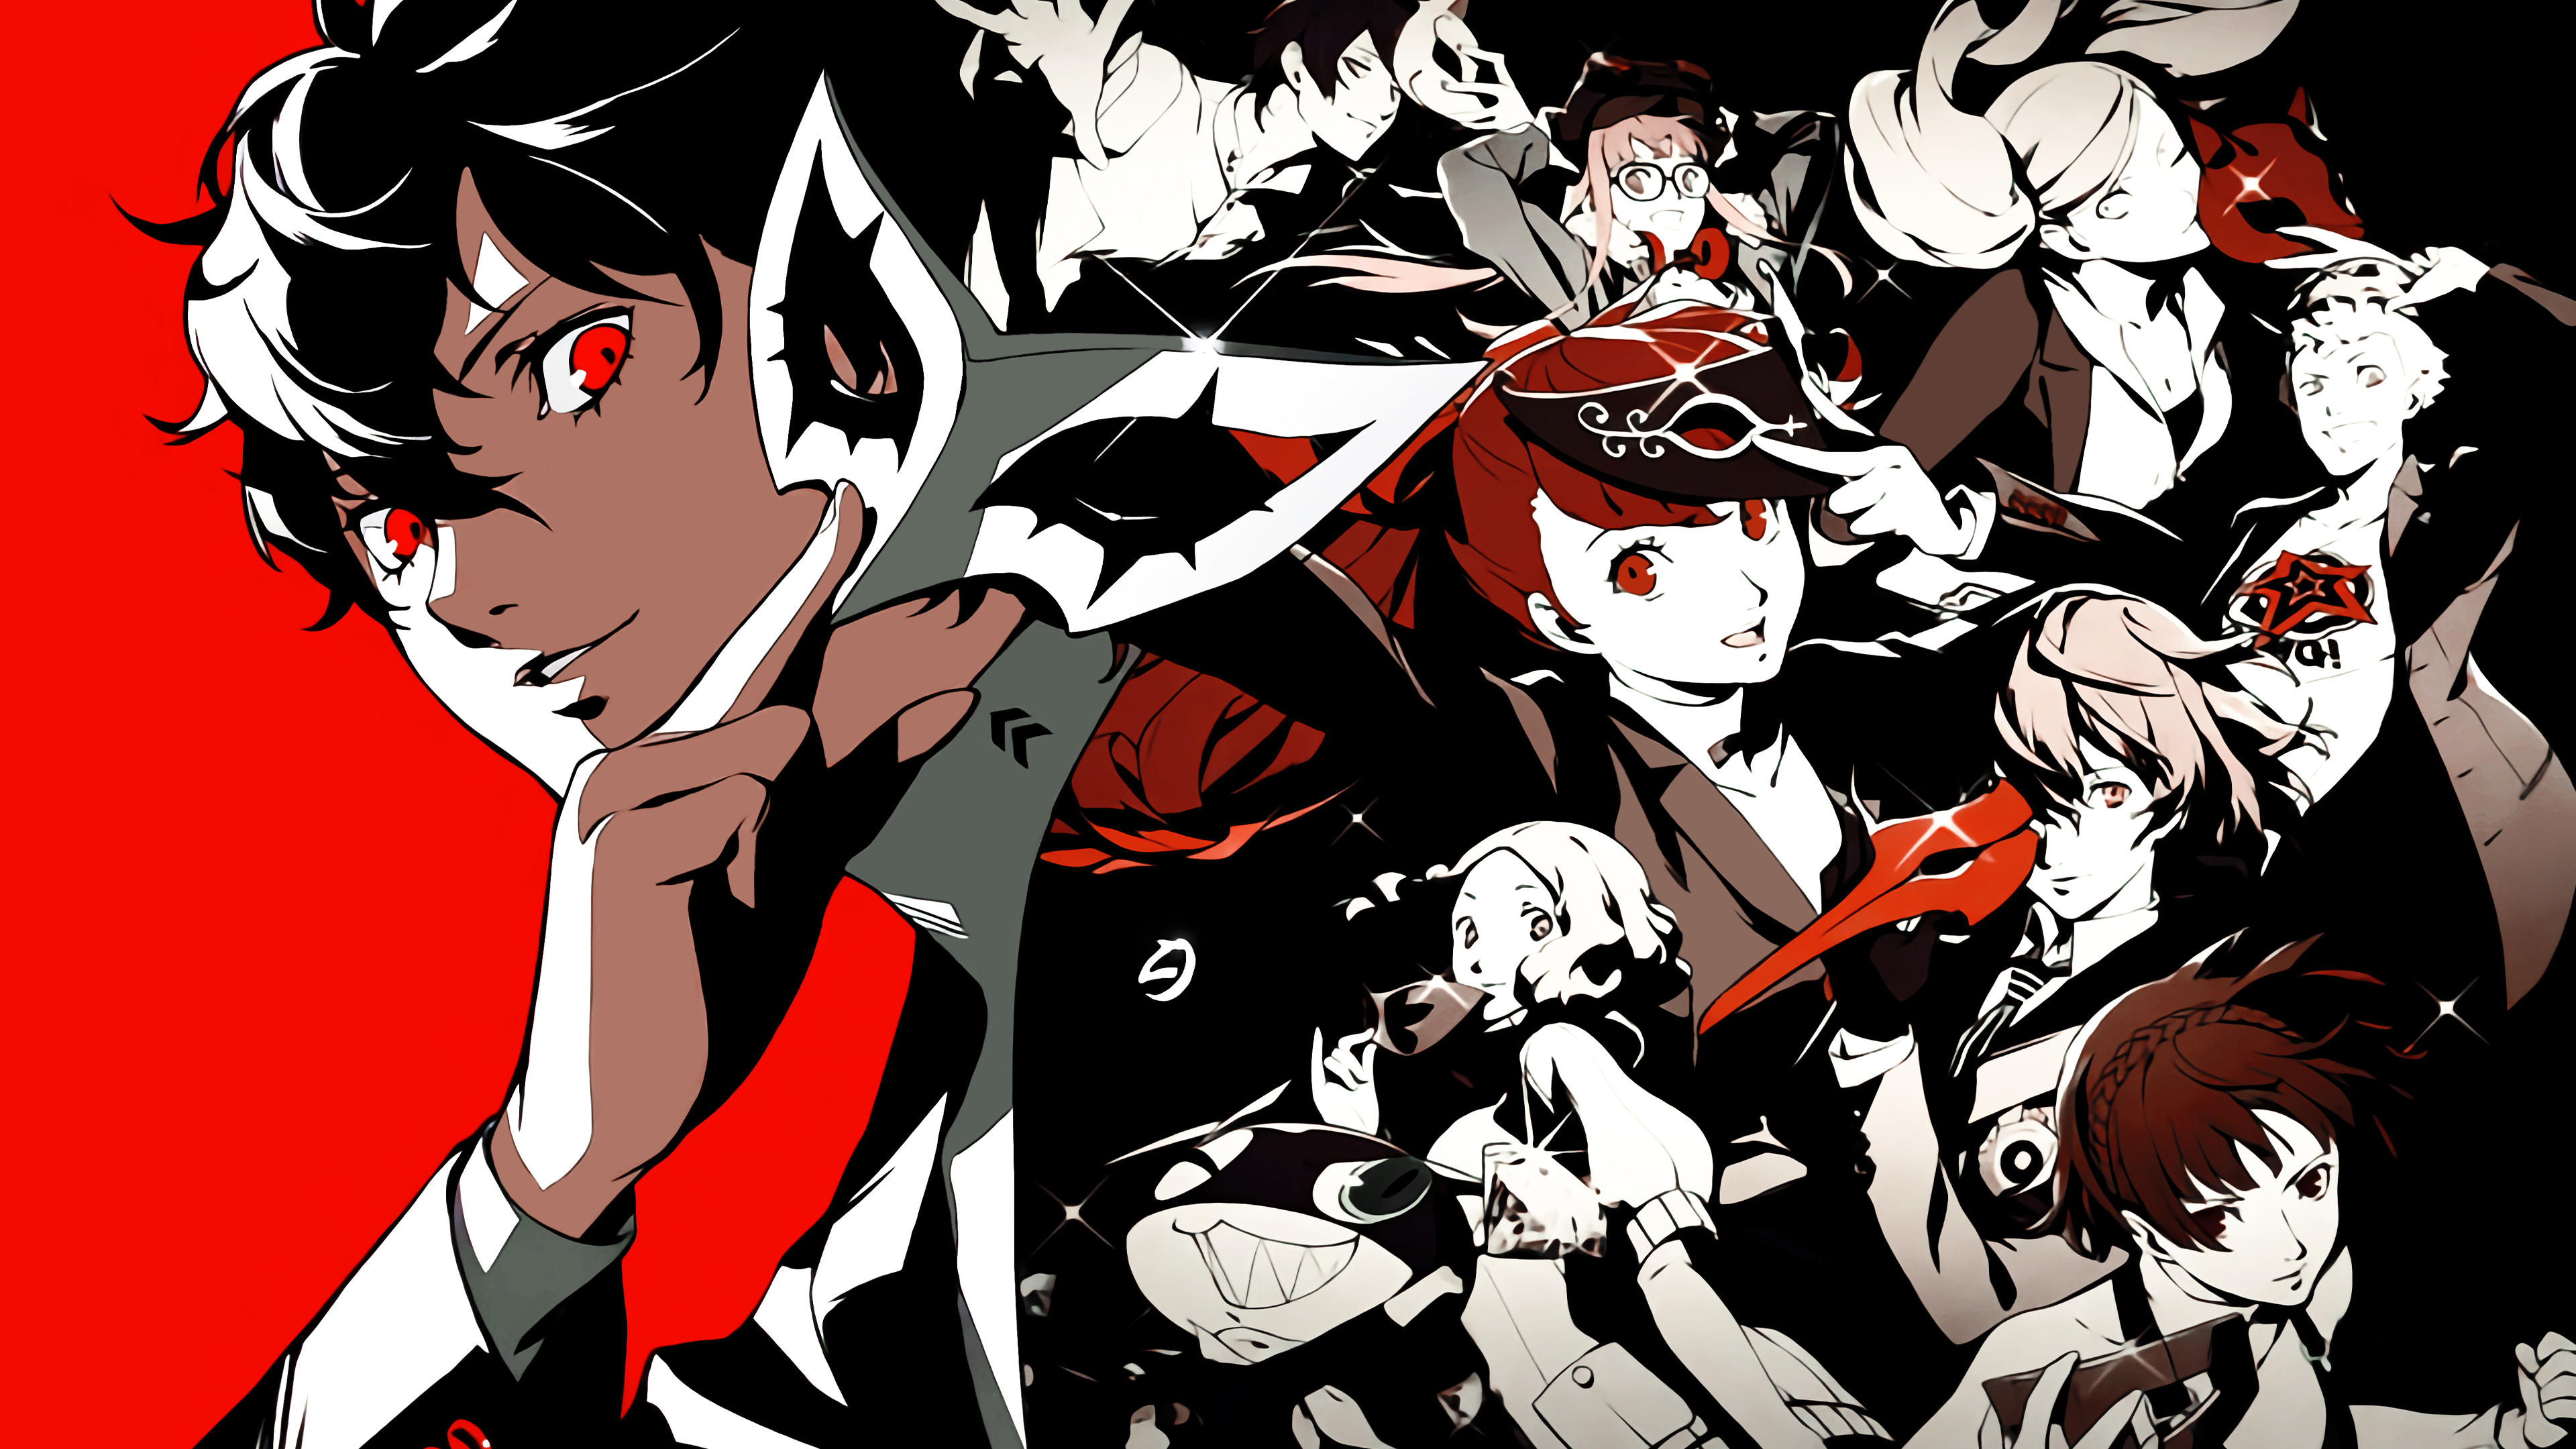 Persona Royal 2020 Wallpaper, HD Games 4K Wallpapers ...